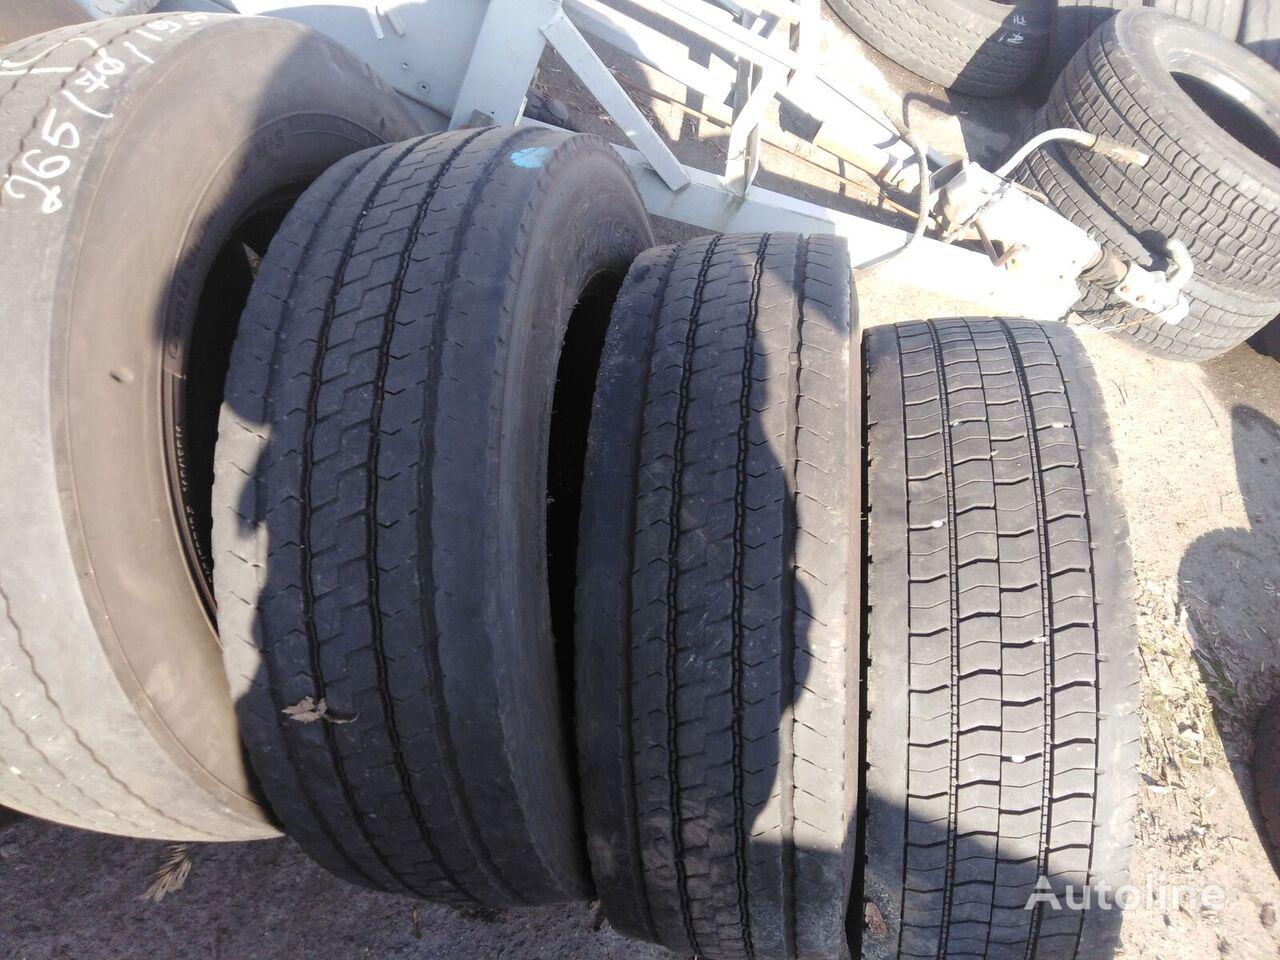 Hankook 205/65 R 17.50 truck tire